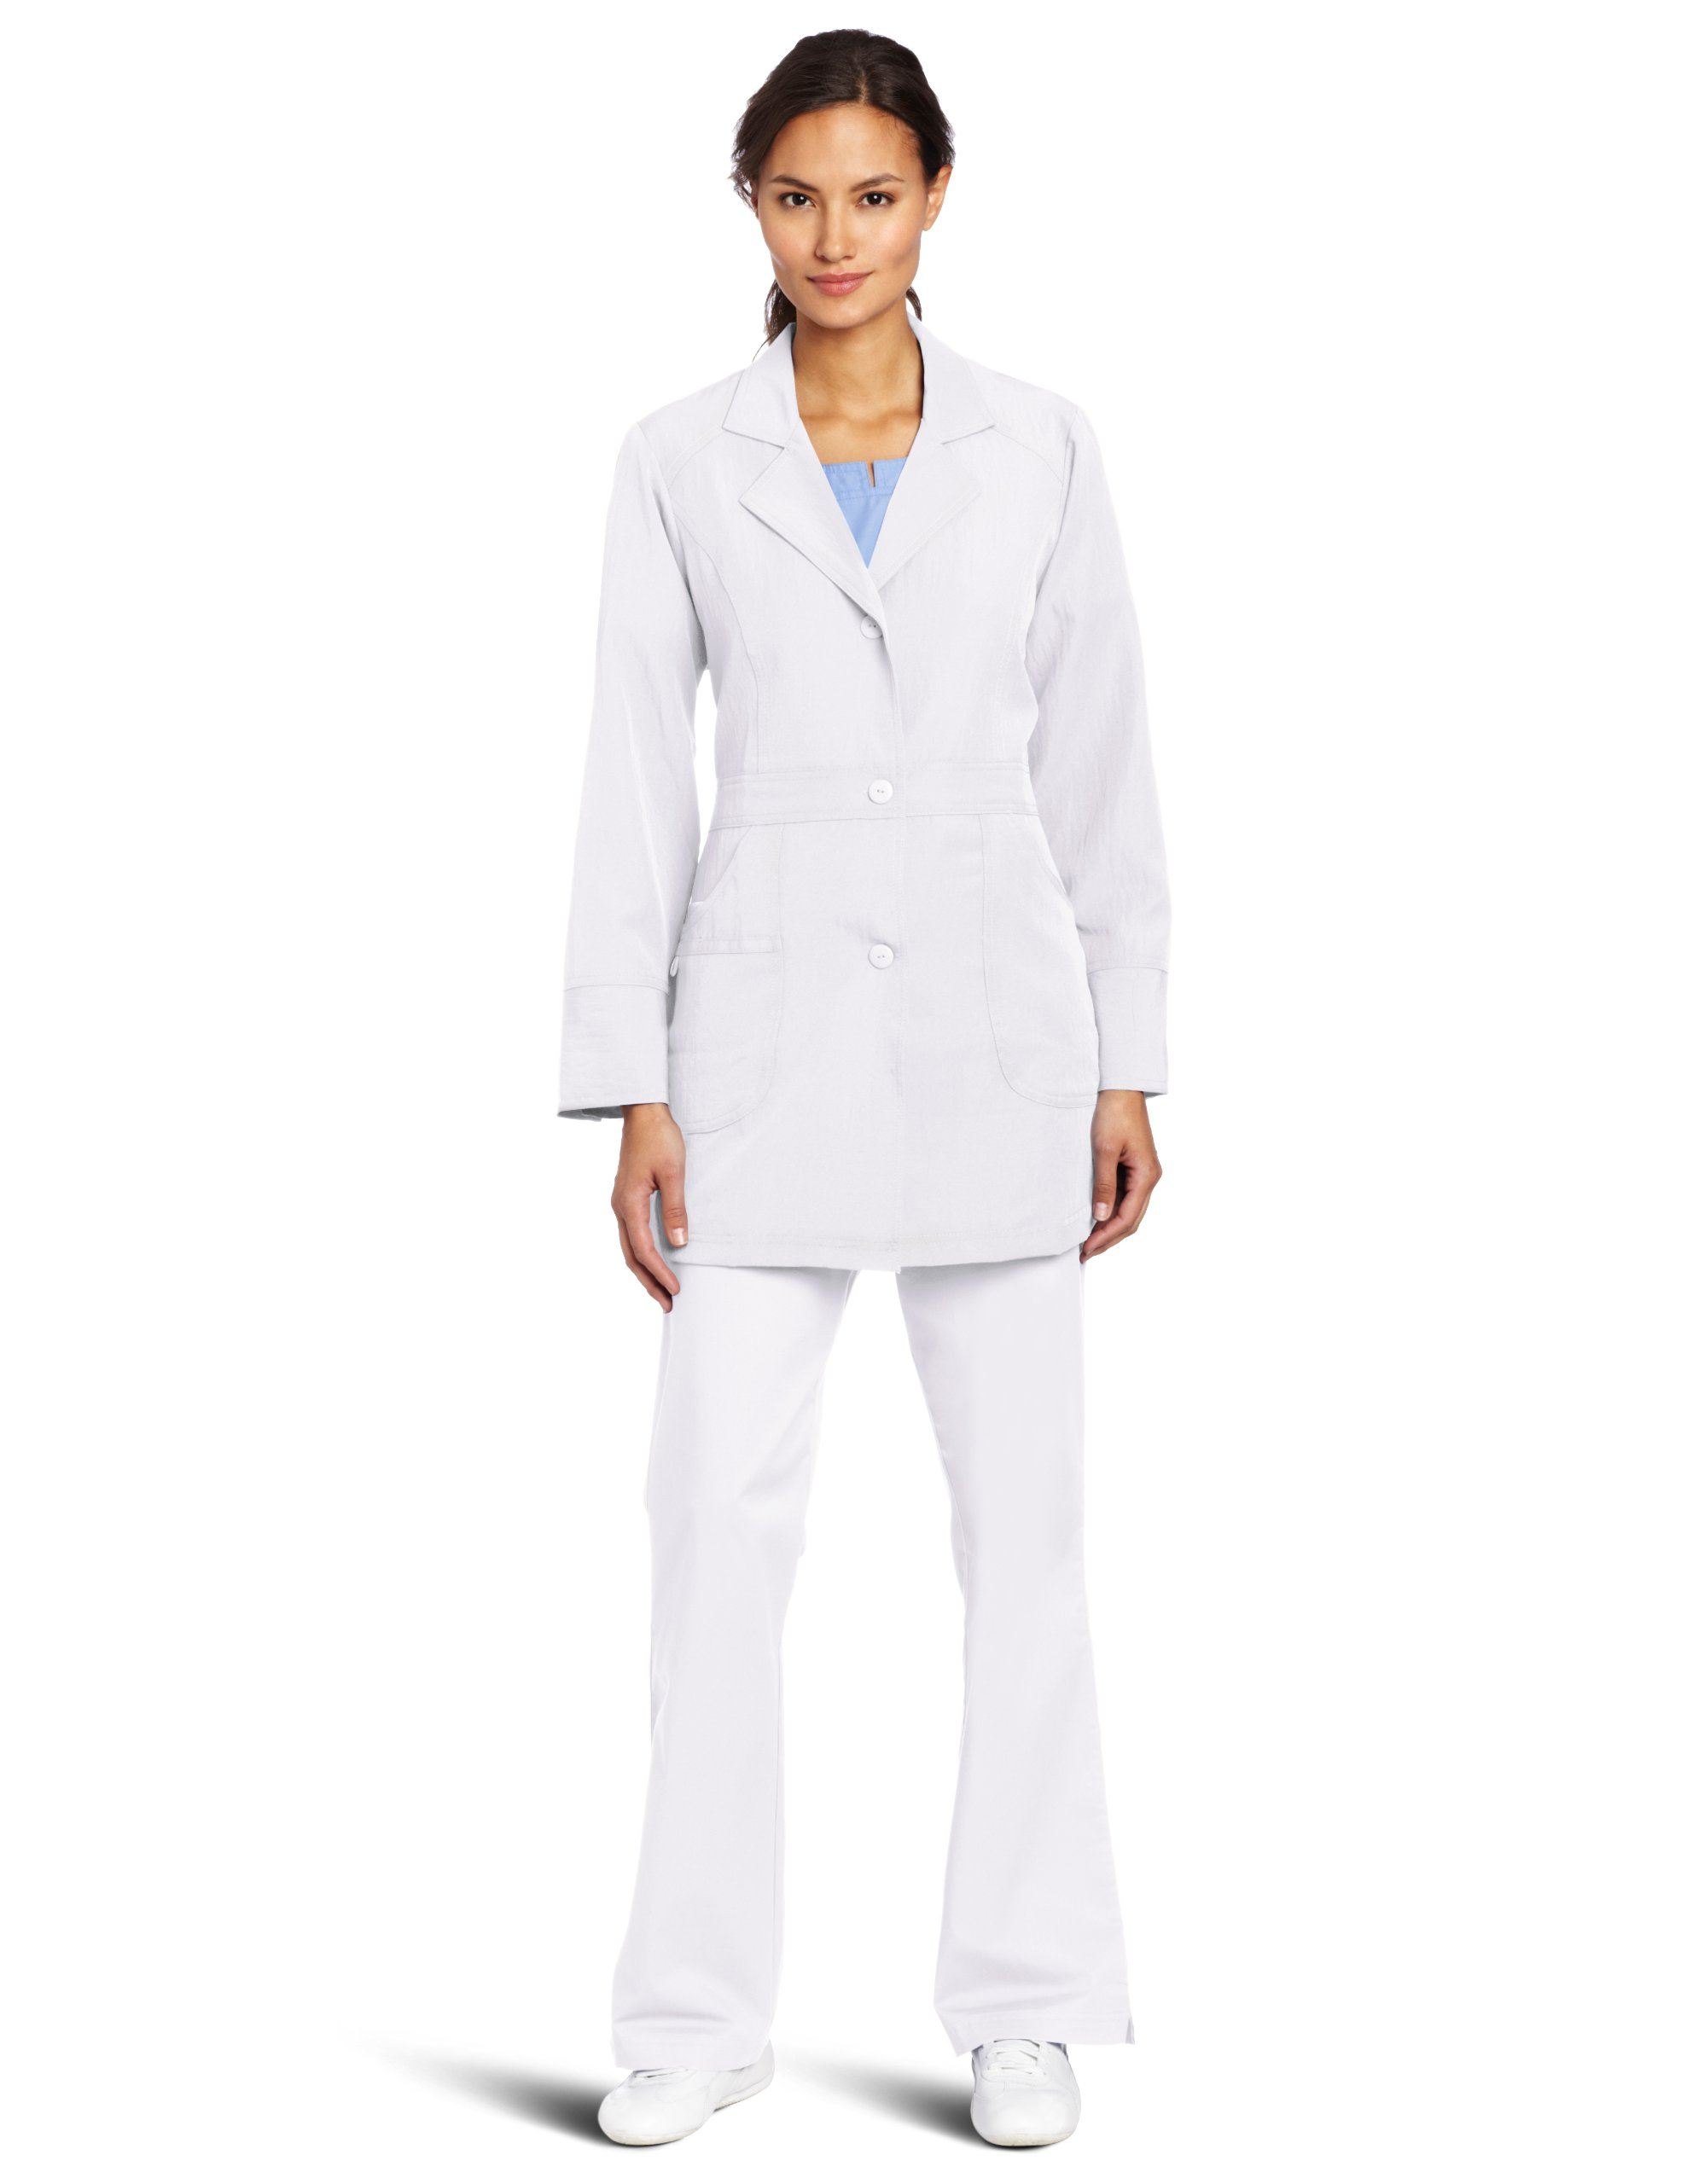 WonderWink Women's Scrubs Utility Girl Stretch Lab Coat, White, Large